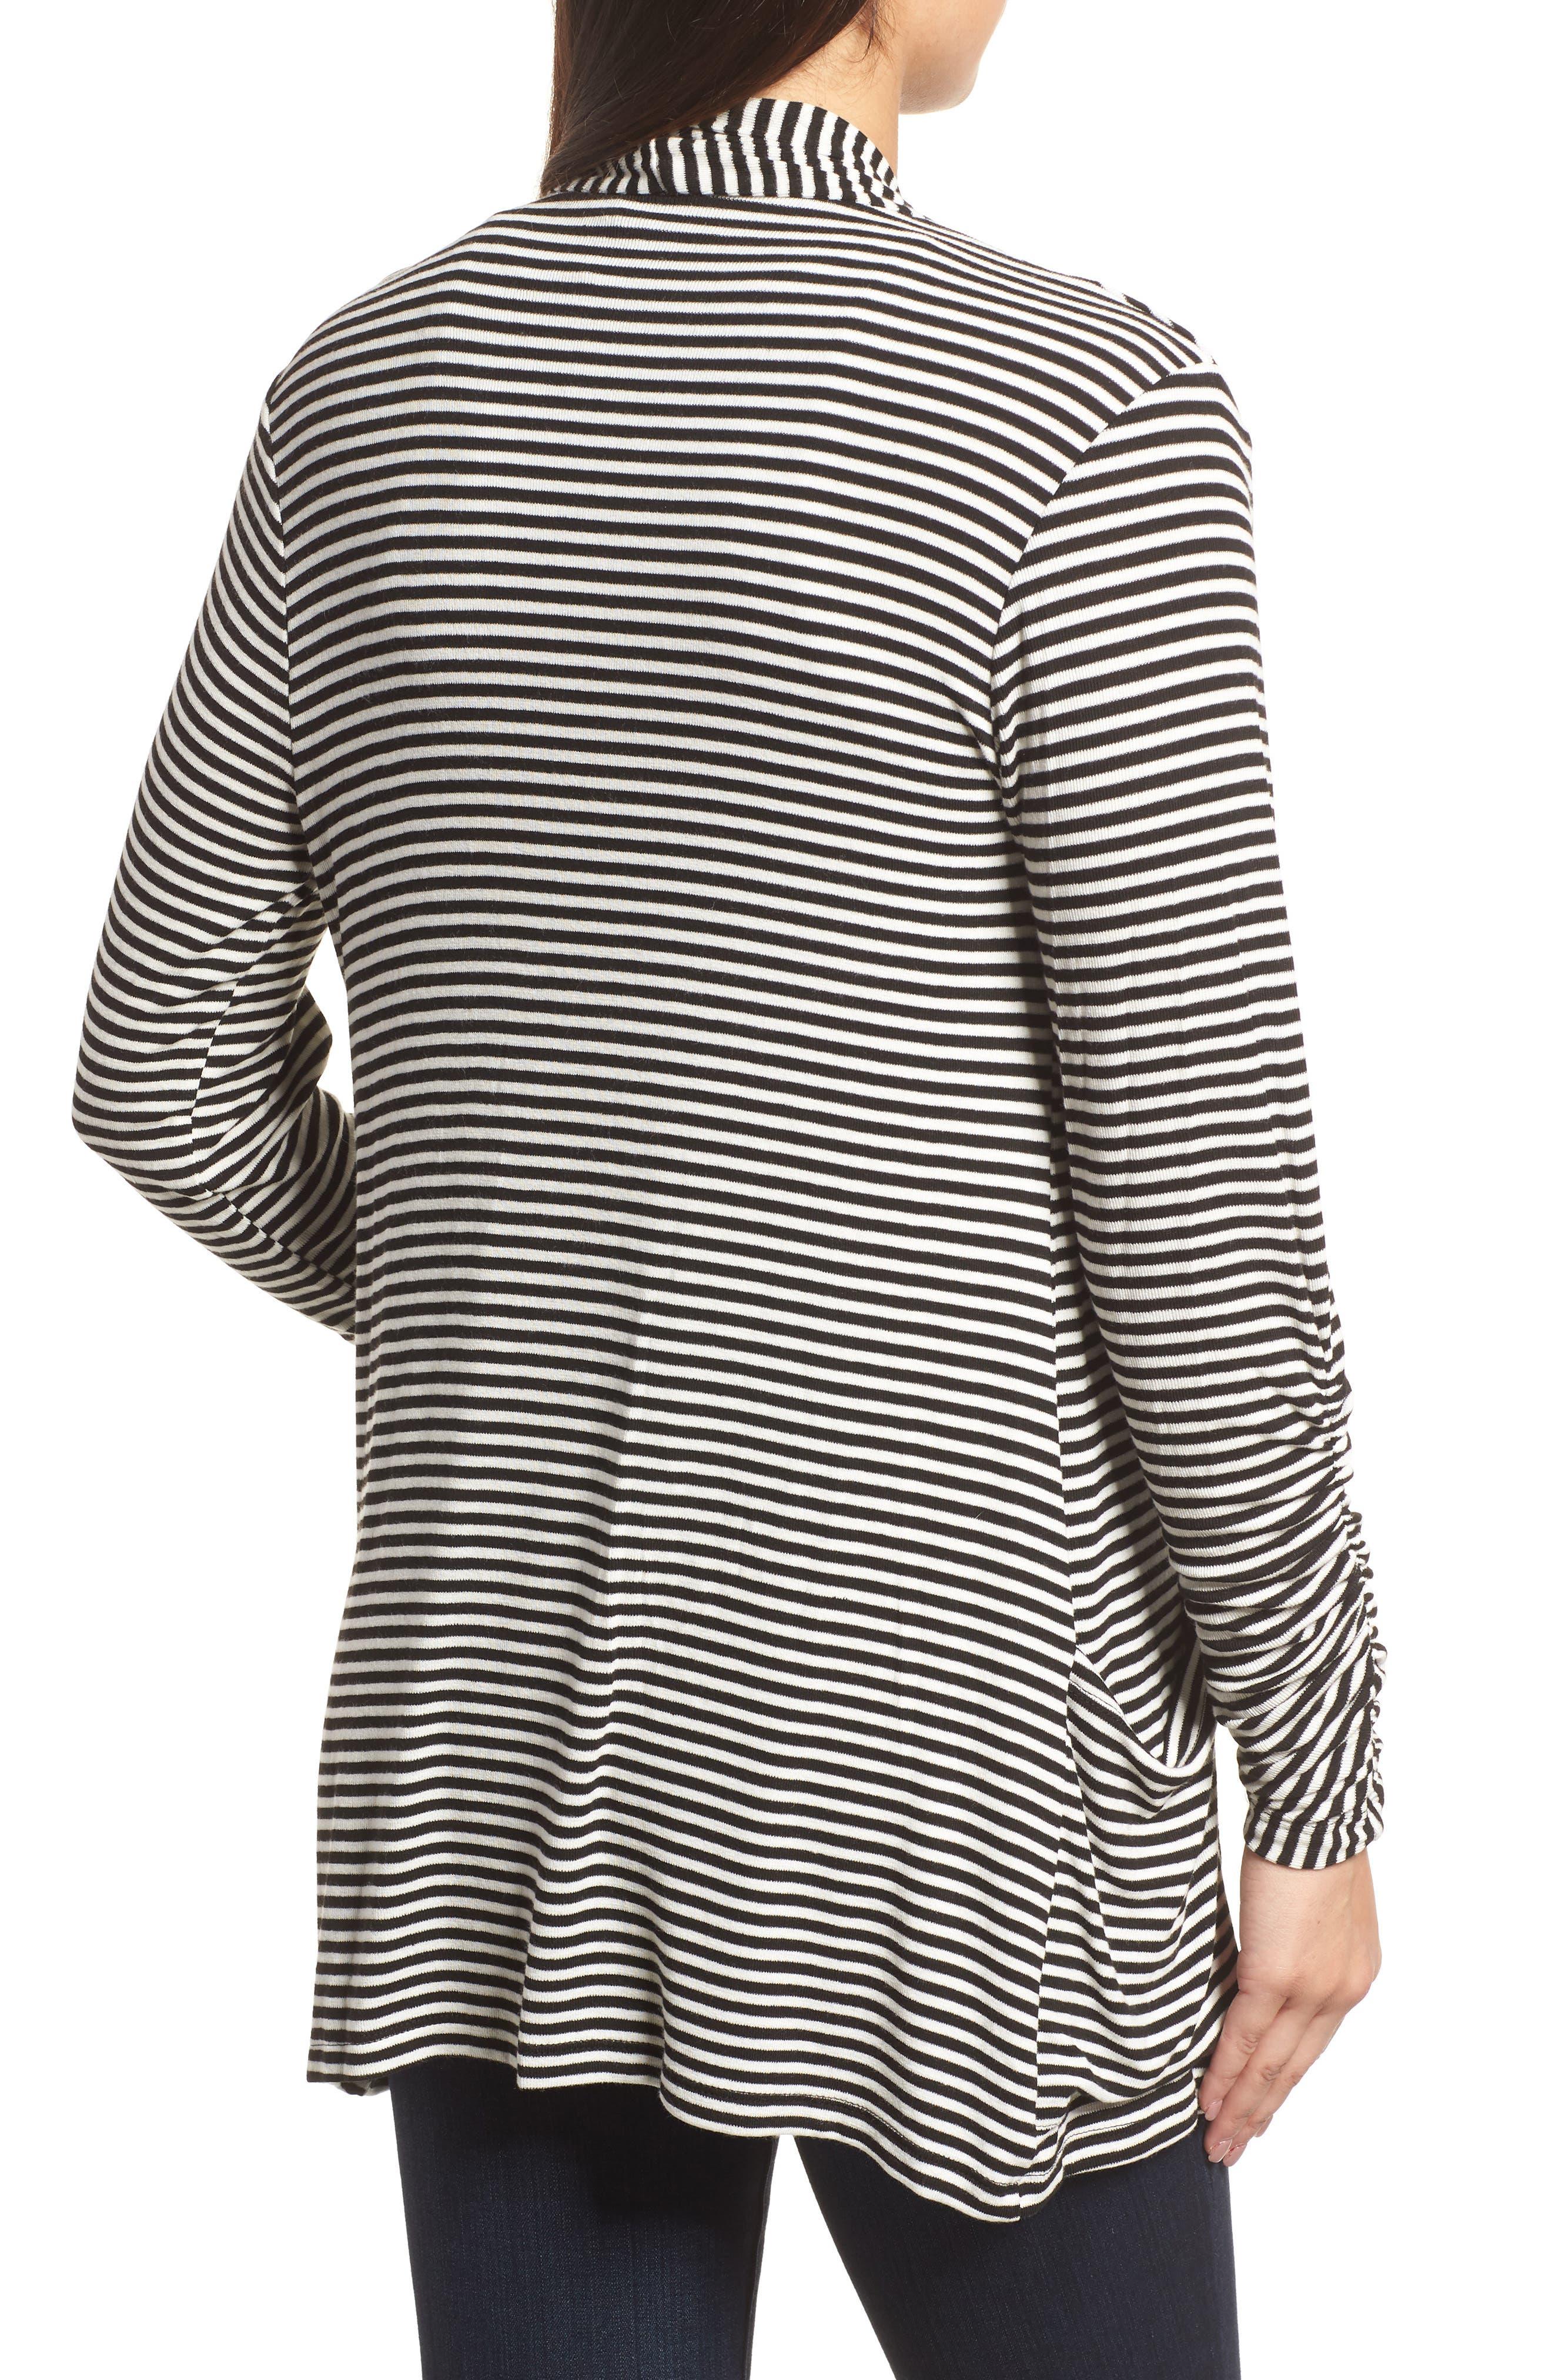 Ruched Sleeve Cardigan,                             Alternate thumbnail 2, color,                             Black/ White Stripe